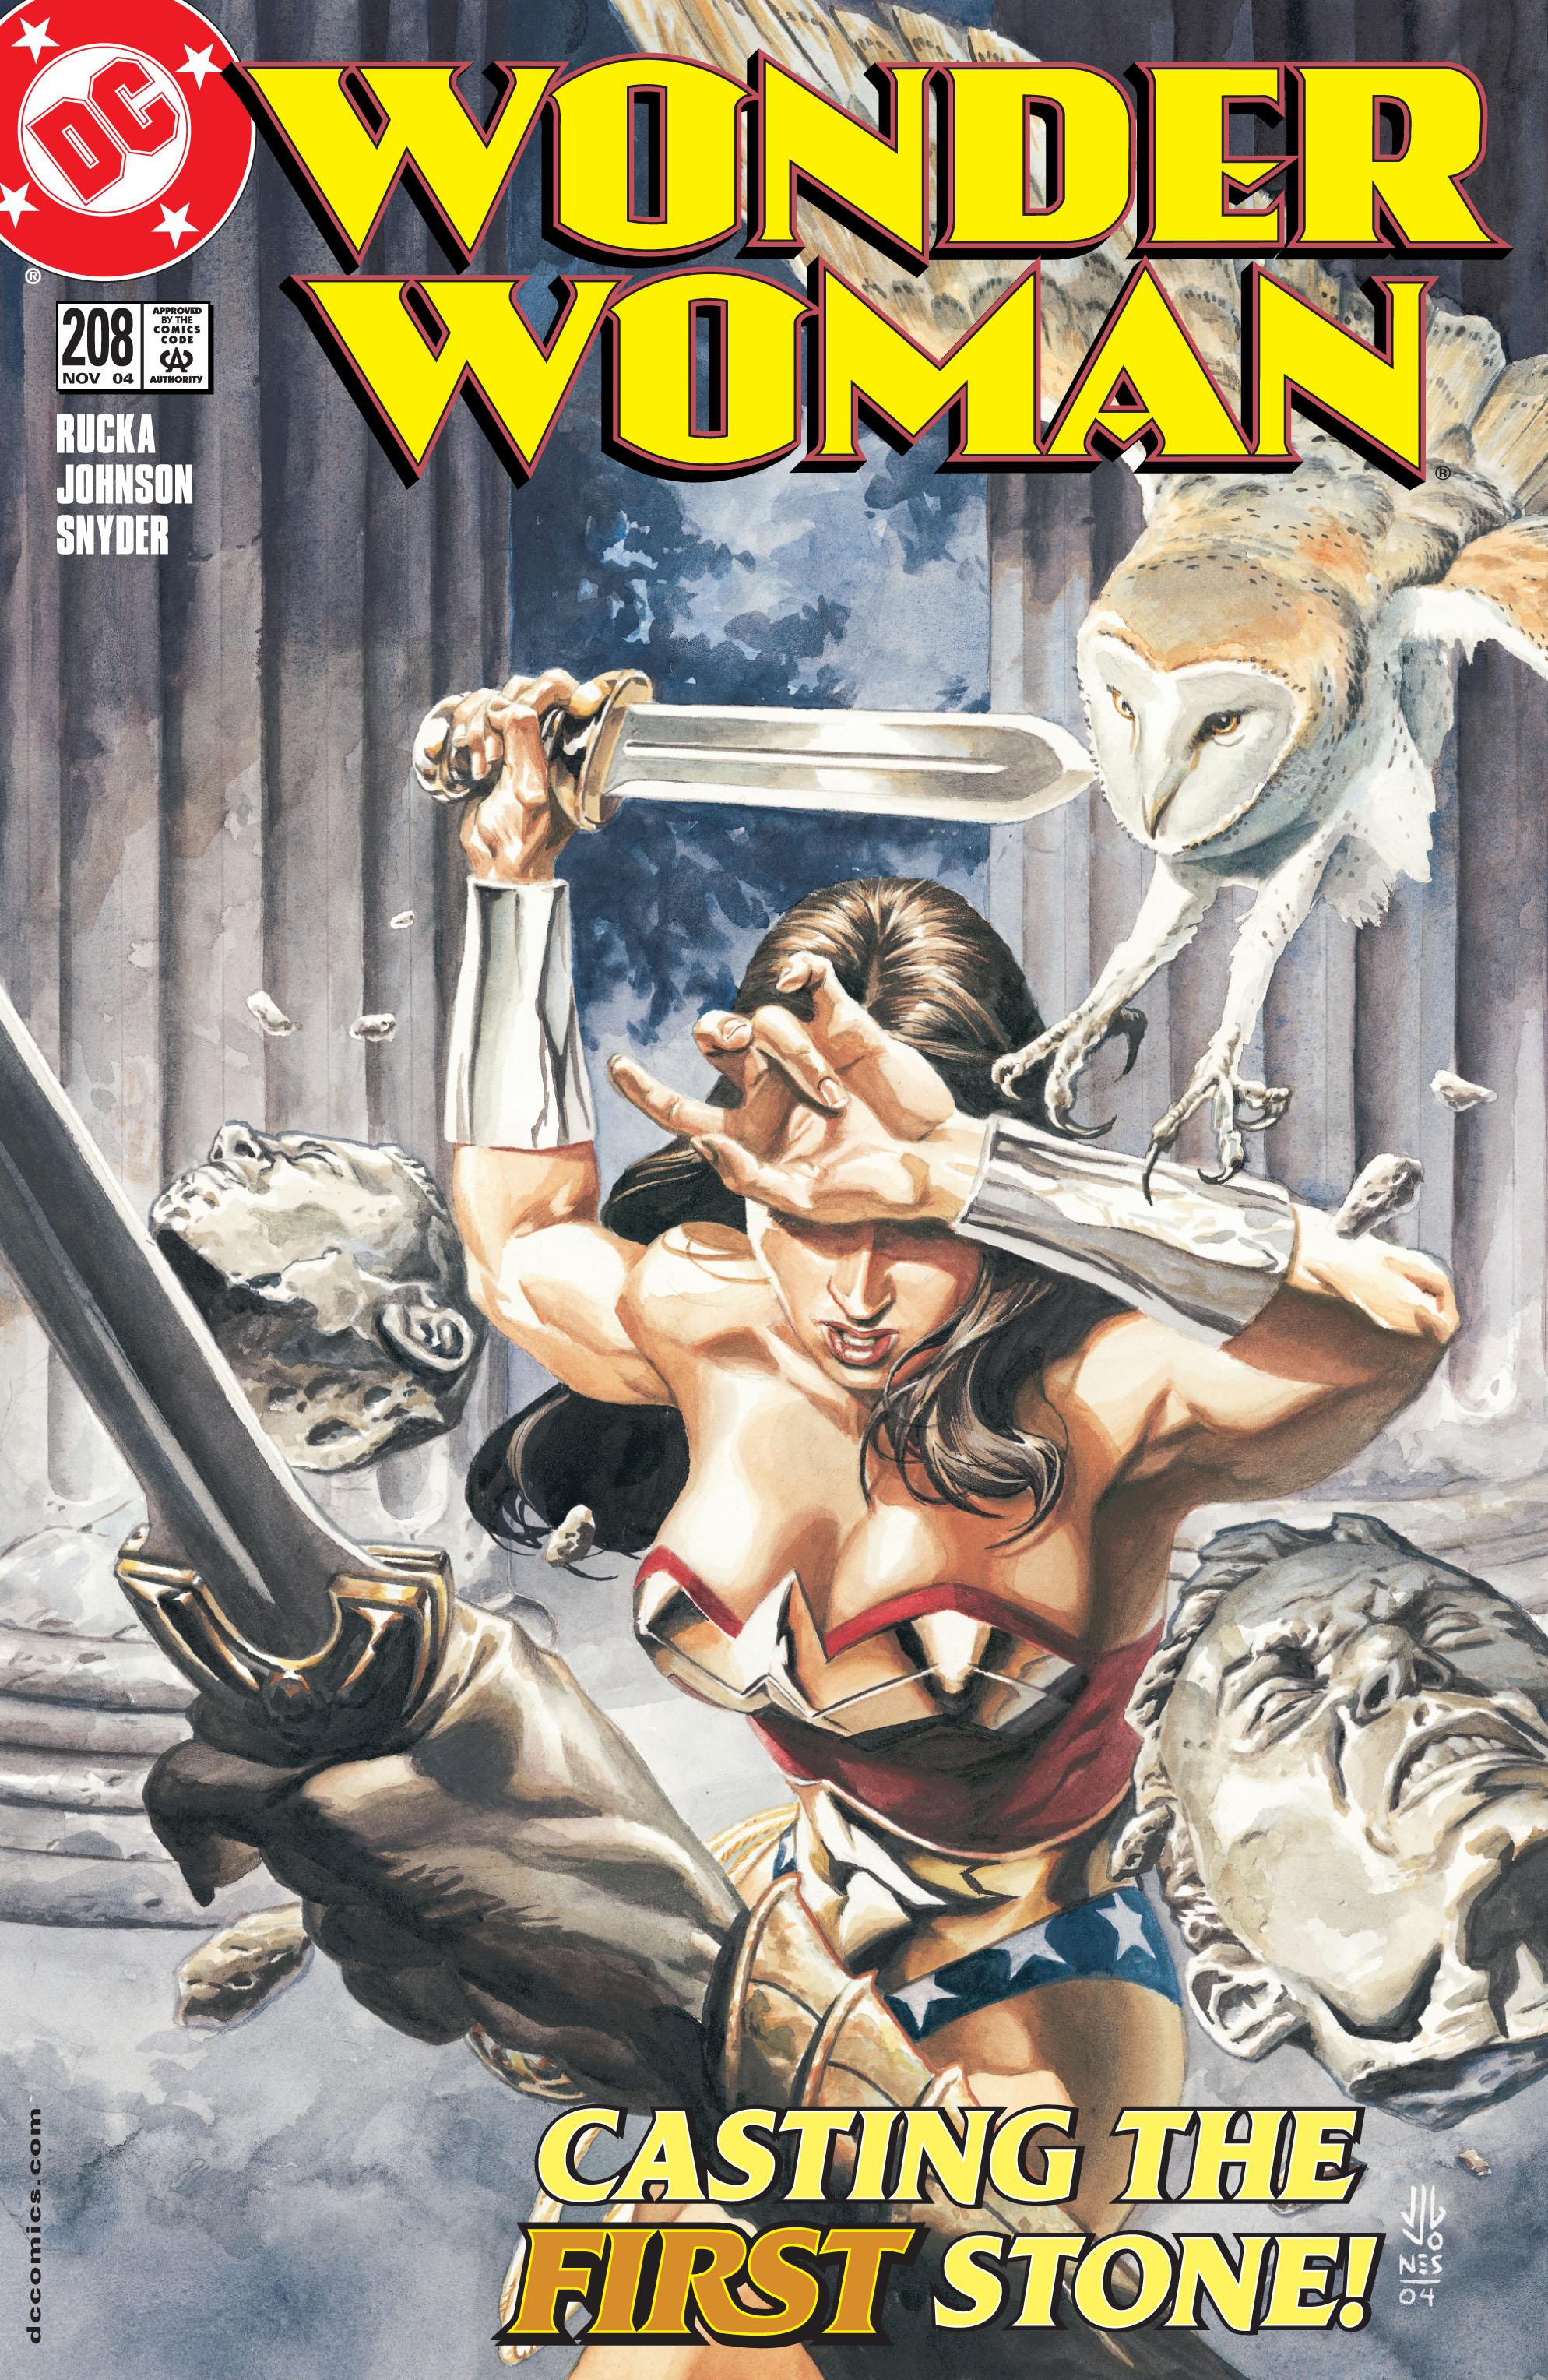 Read online Wonder Woman (1987) comic -  Issue #208 - 1